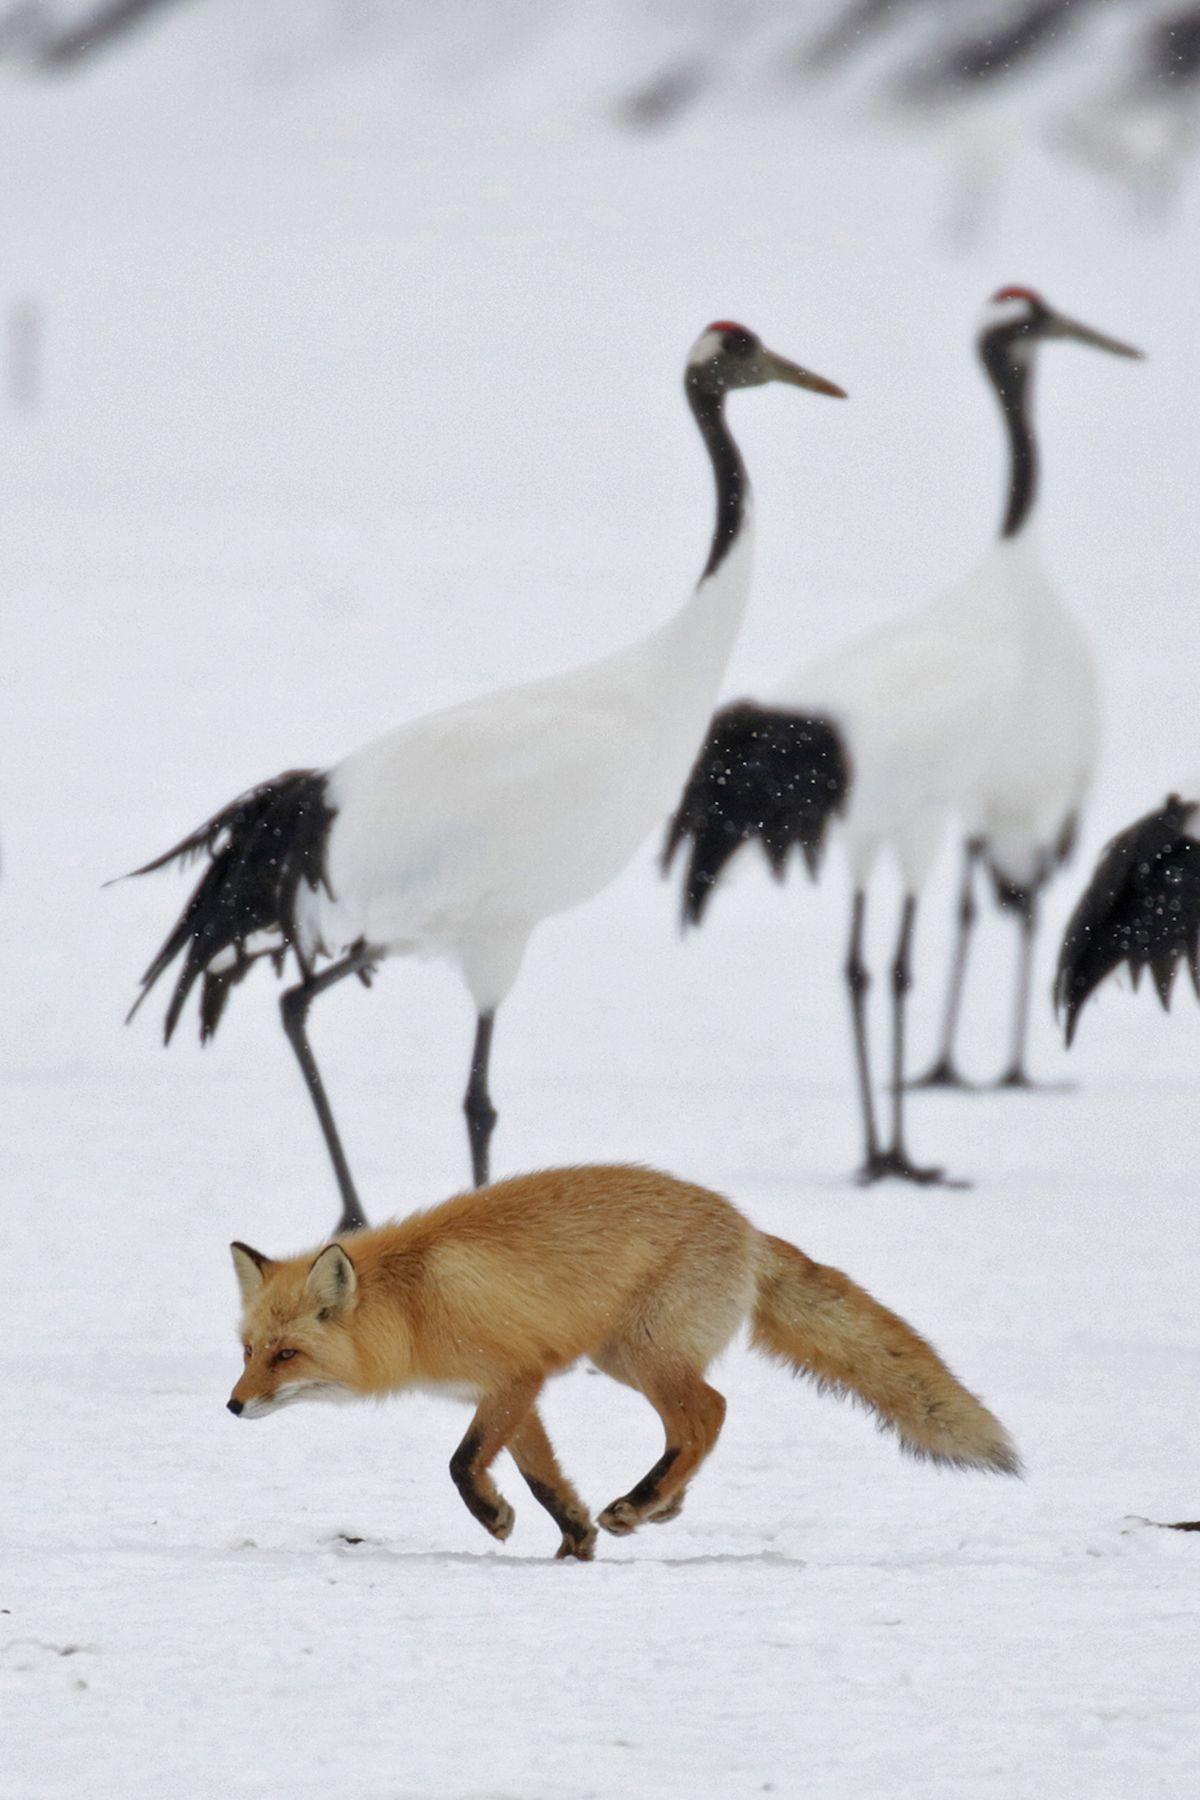 A Red Fox runs through a flock of Japanese Cranes